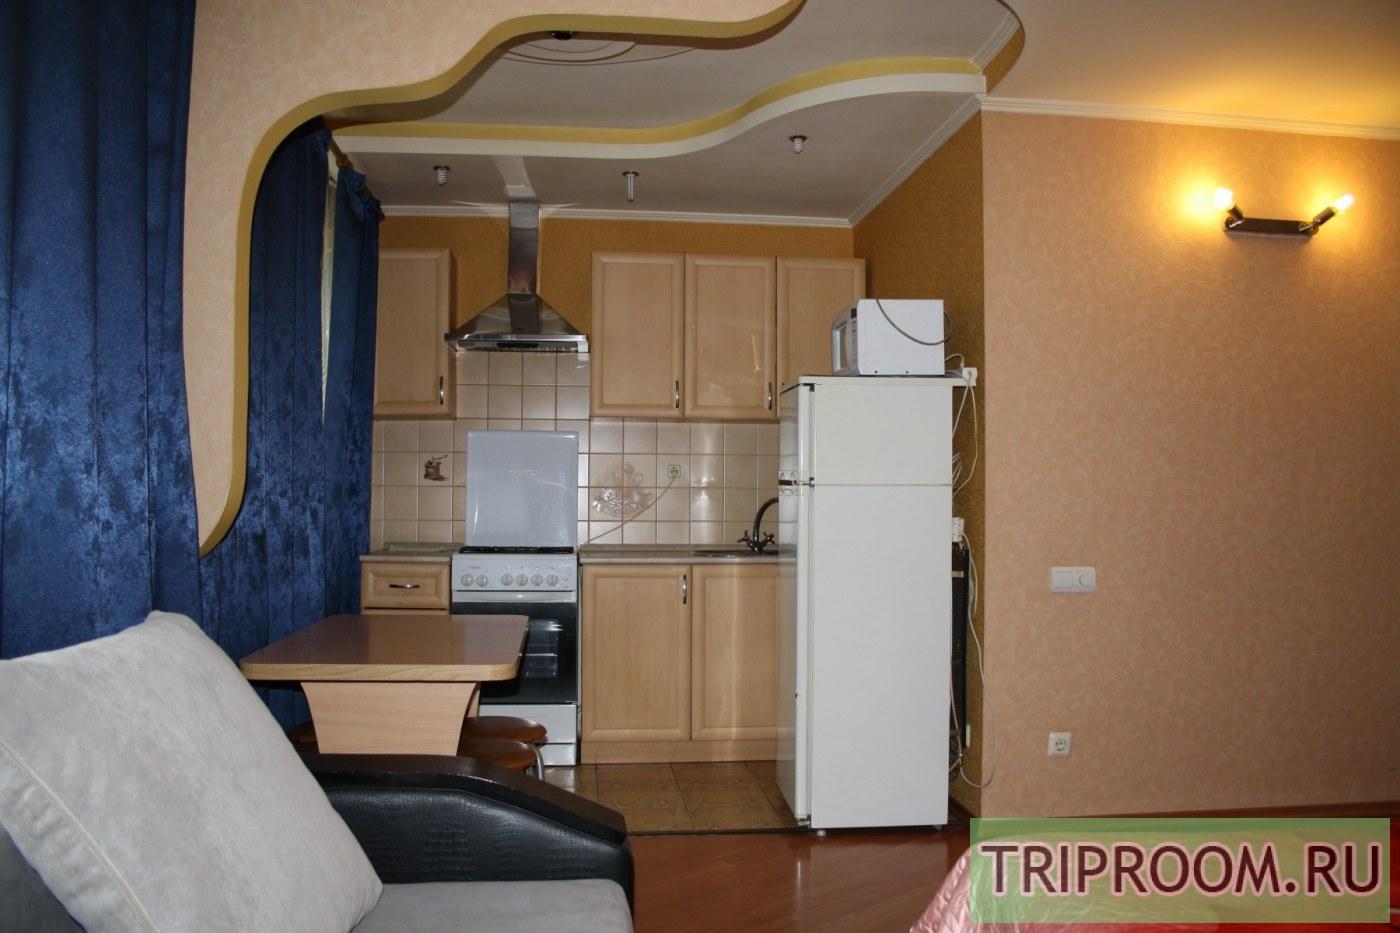 1-комнатная квартира посуточно (вариант № 39644), ул. Ипподромная улица, фото № 3